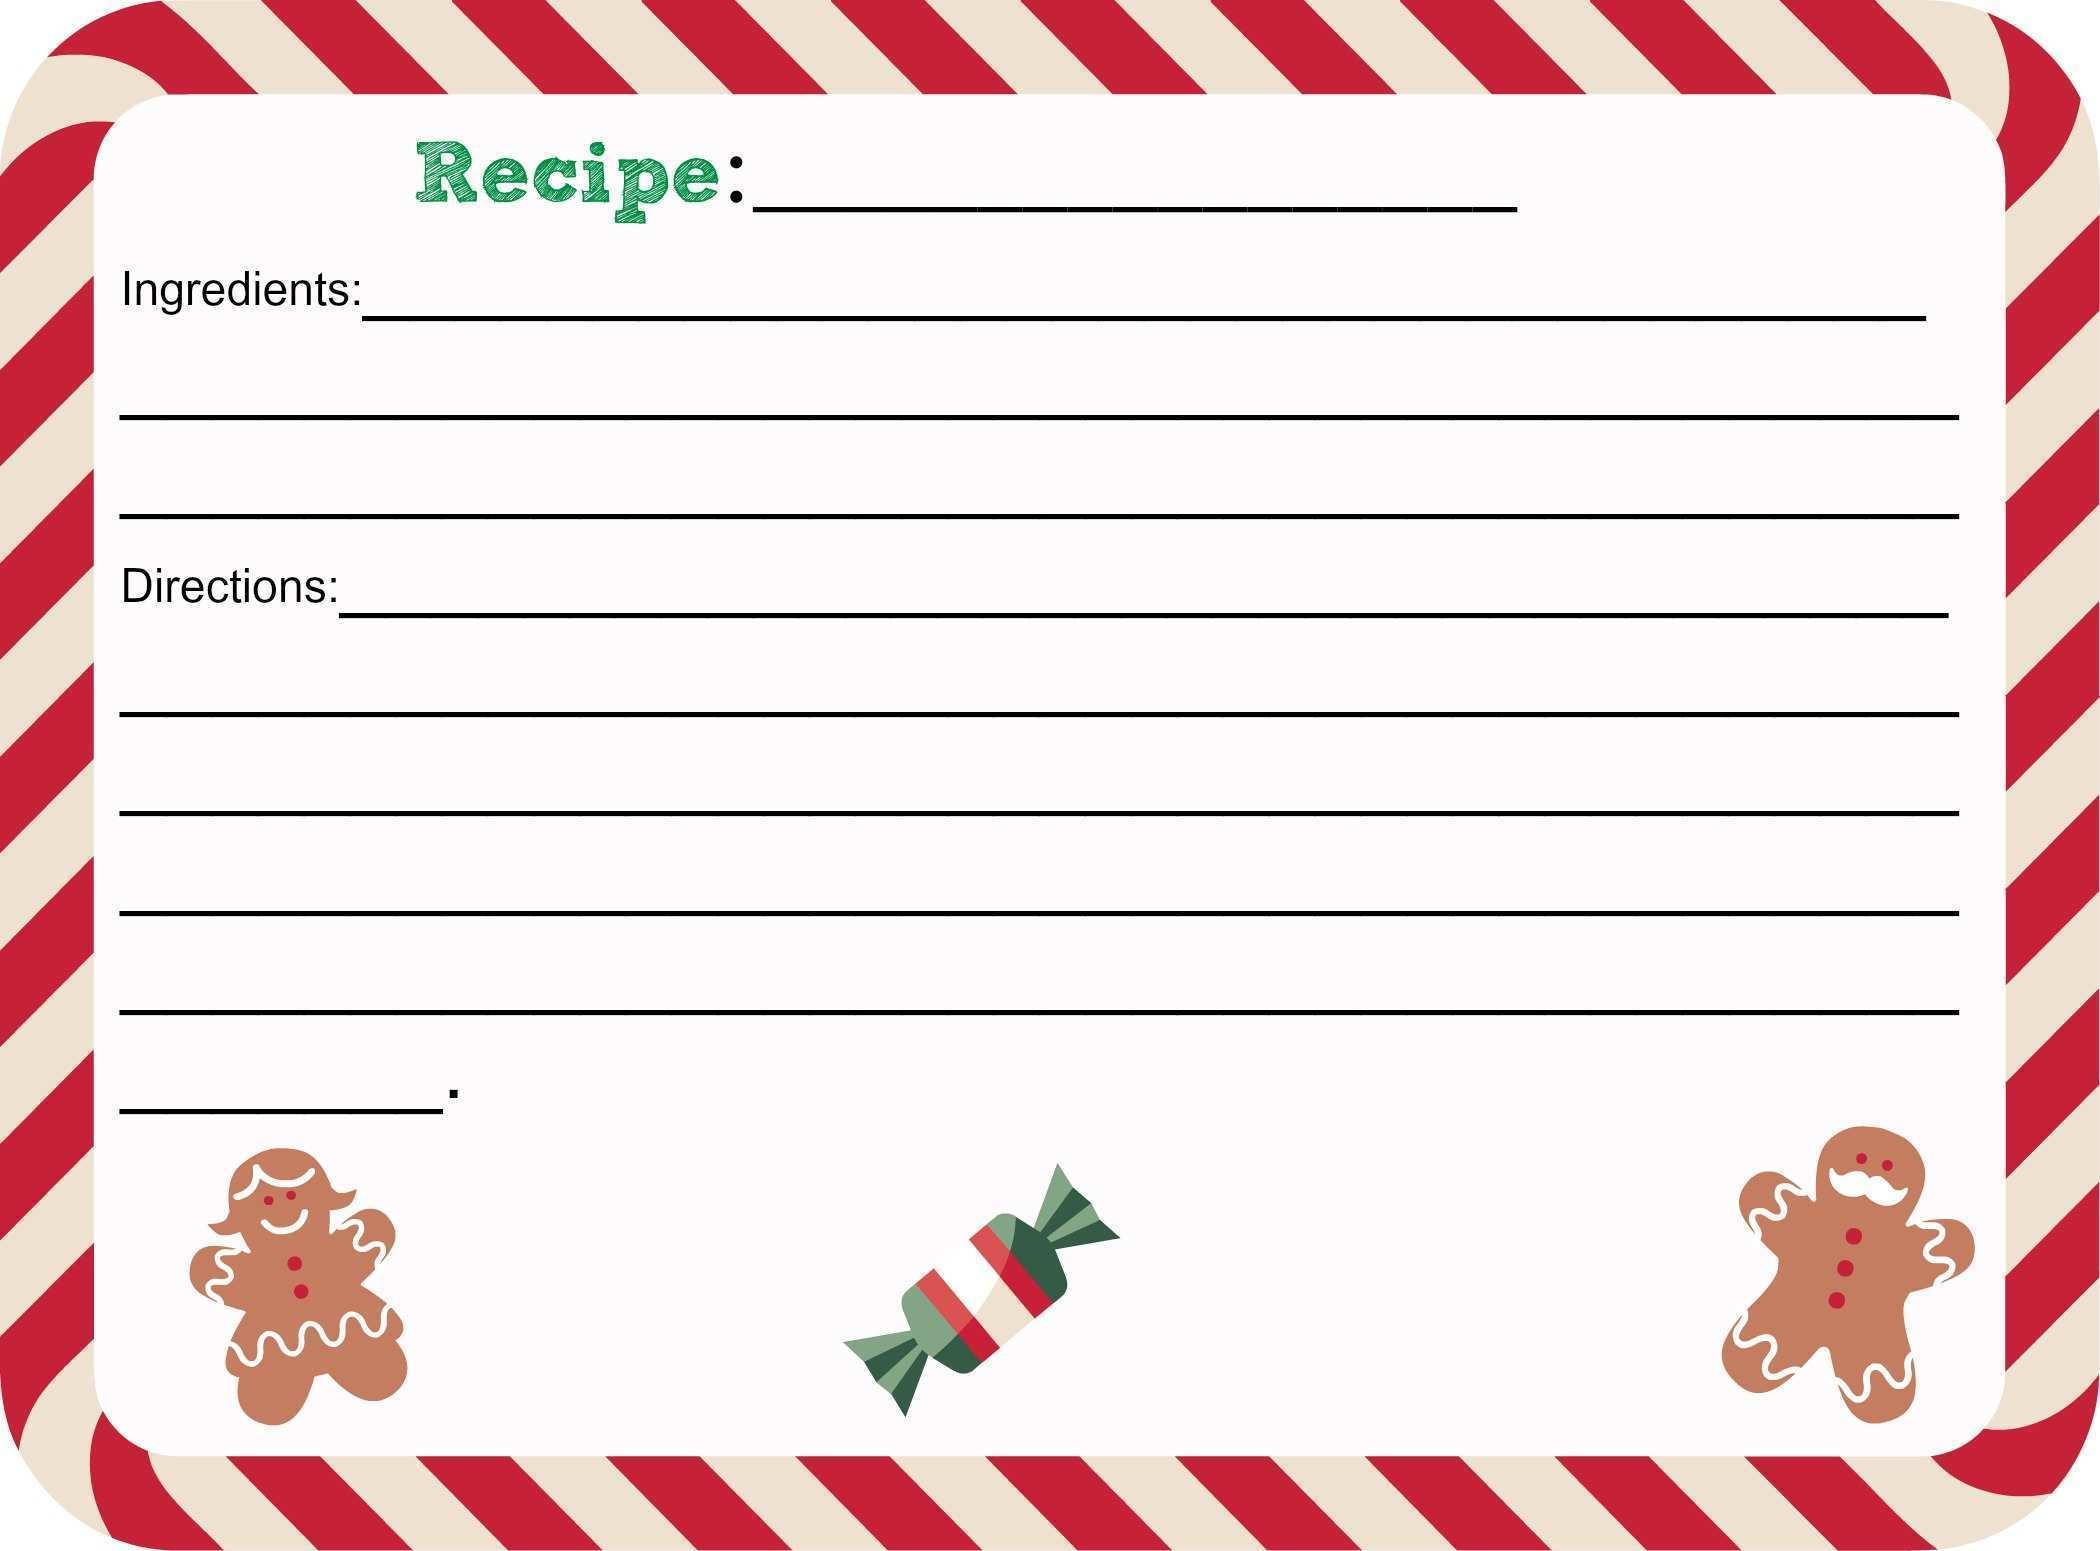 41 Create Christmas Recipe Card Template For Mac for Ms Word with Christmas Recipe Card Template For Mac